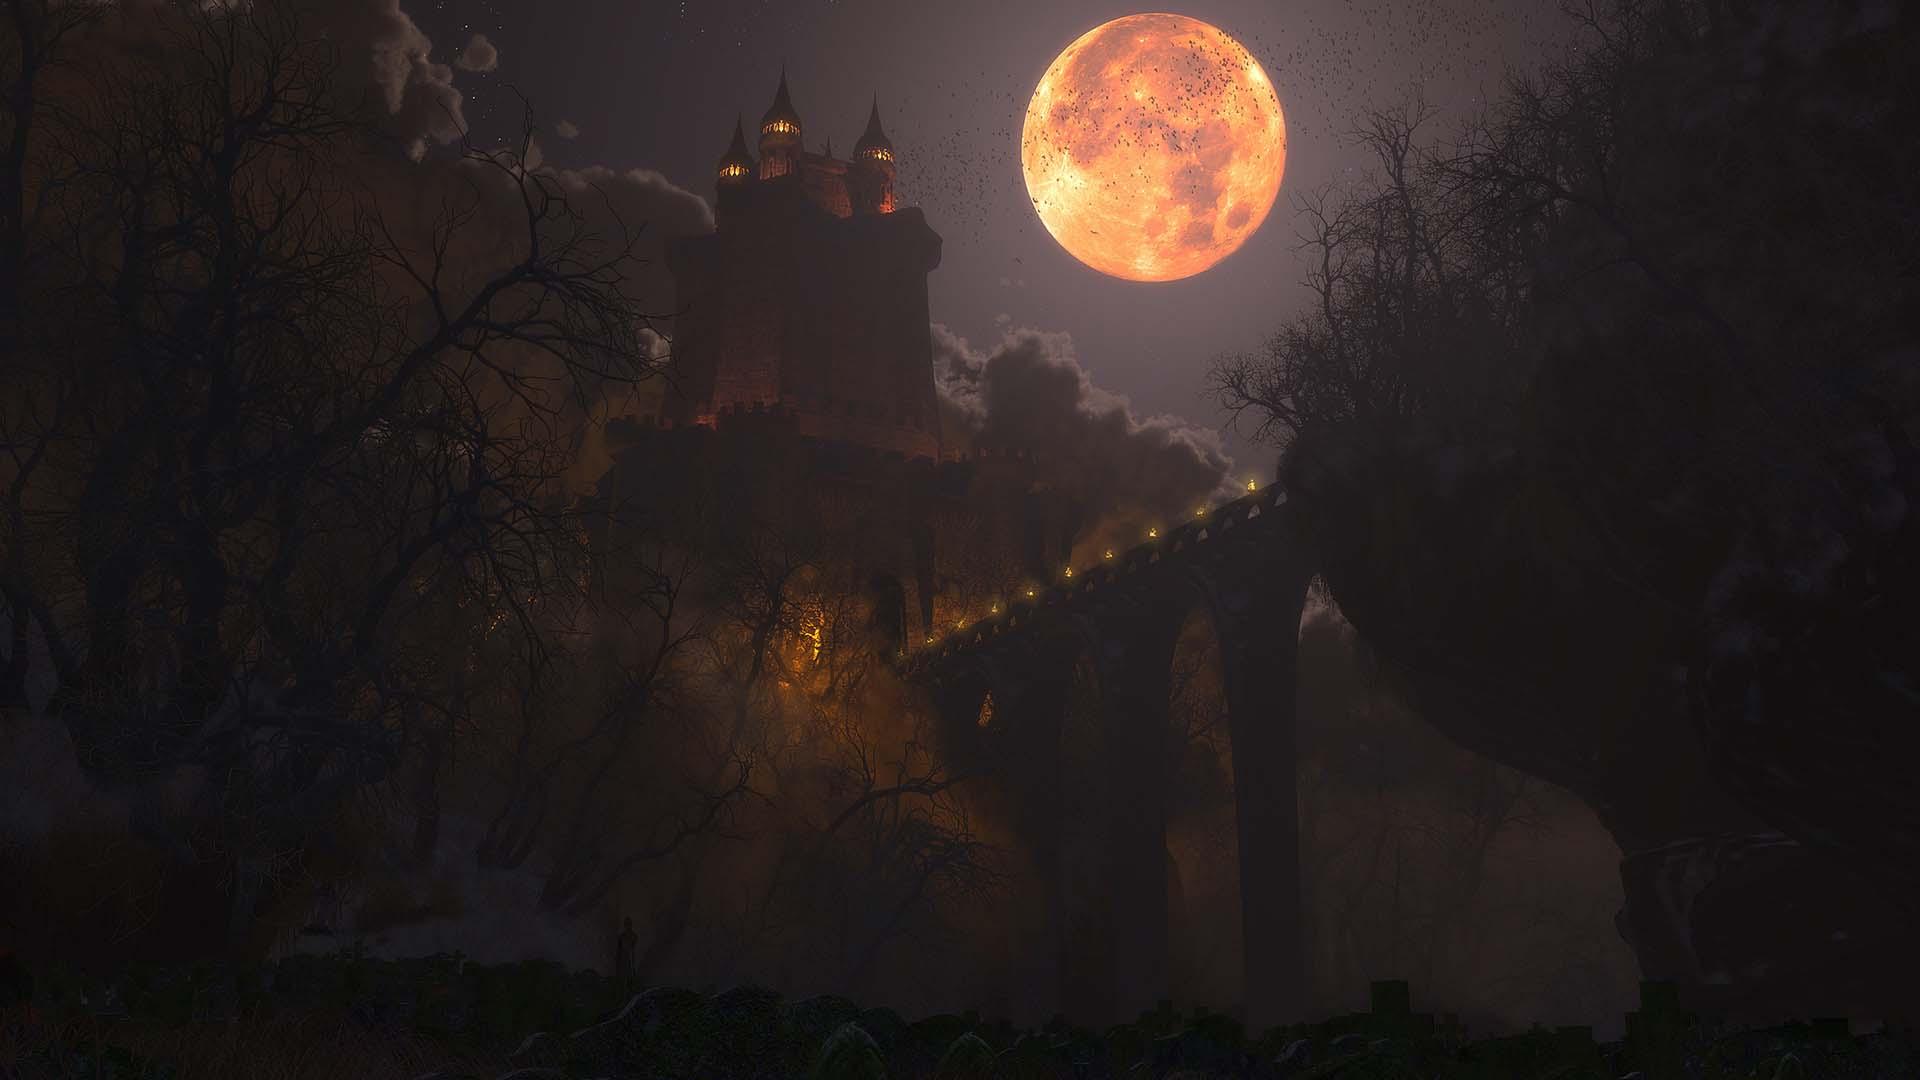 Hình nền Halloween 3D